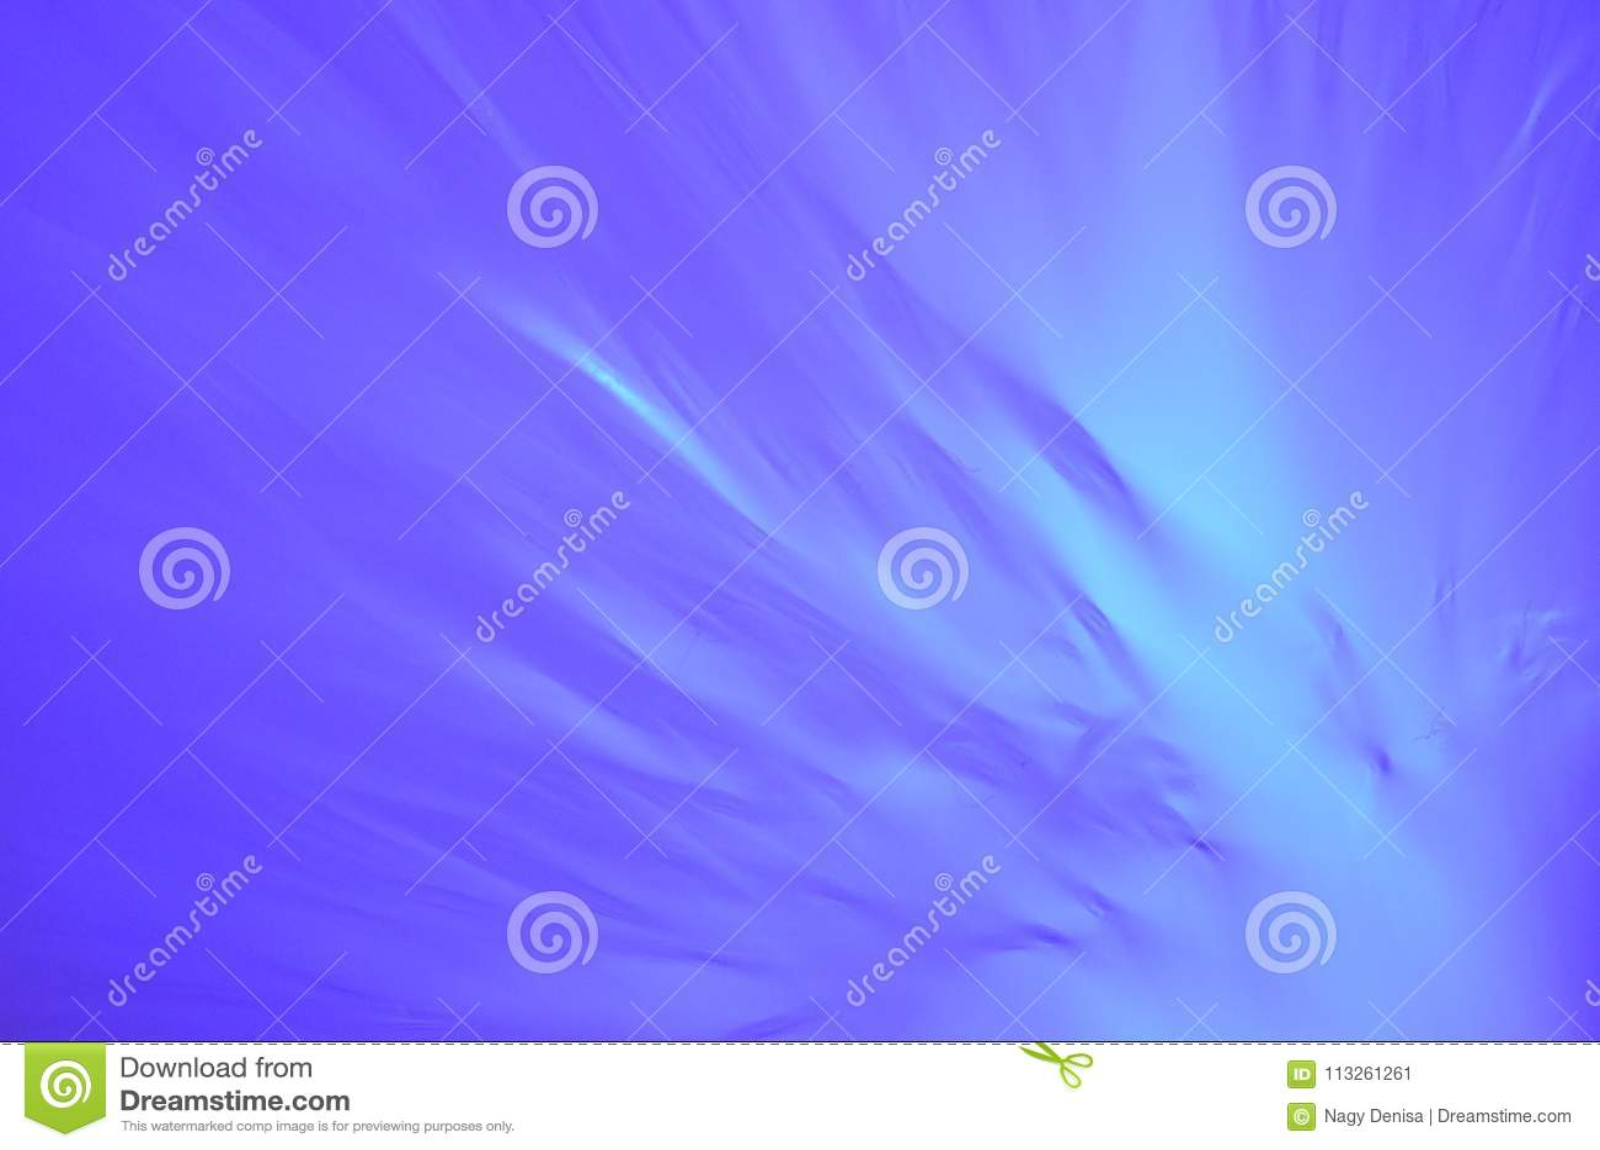 Light Ocean Blue Beautiful Wallpaper Stock Image Image Of Totally